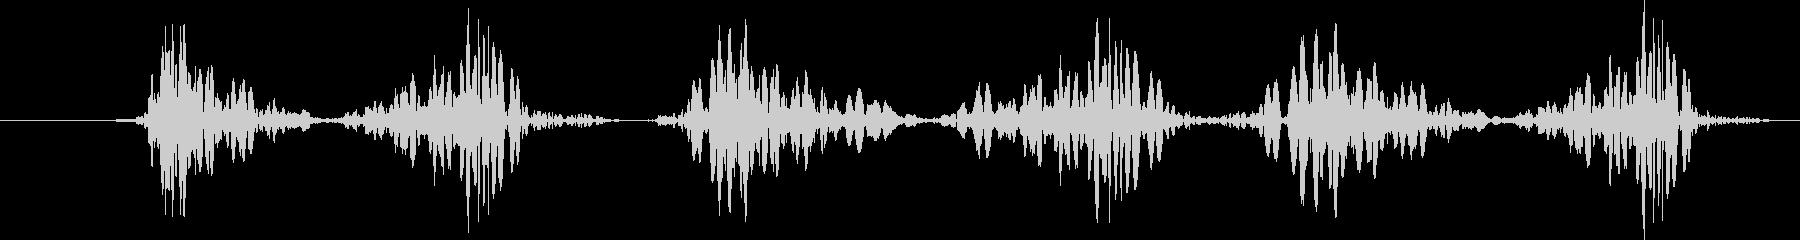 Djドラムスクラッチ、ショート、ス...の未再生の波形